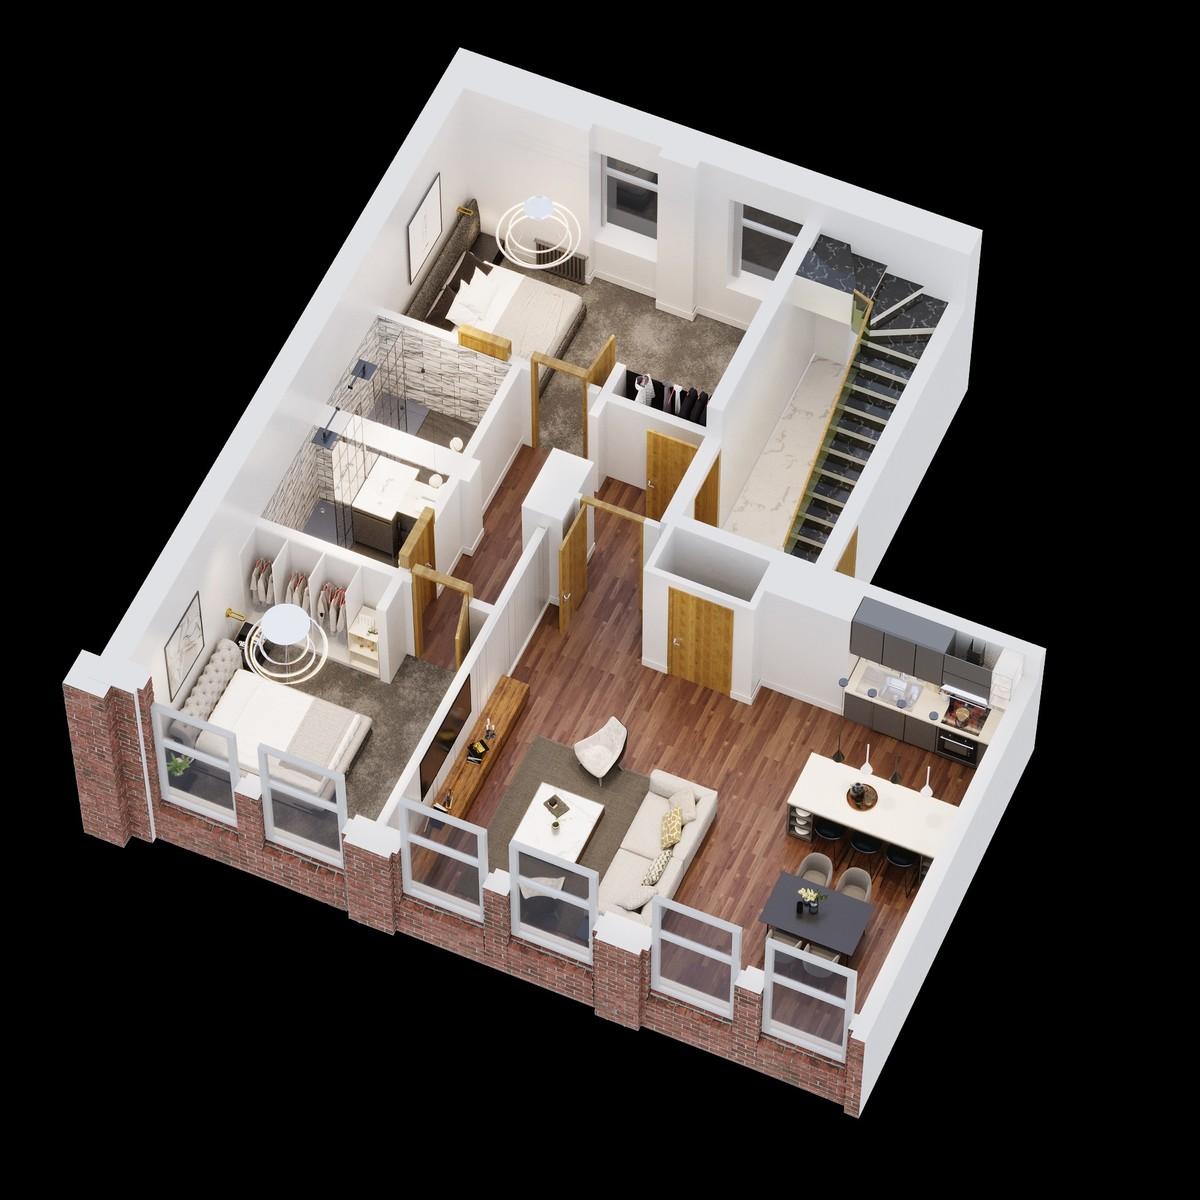 Sydenham Place, Tenby Street North, Birmingham floorplan 2 of 2